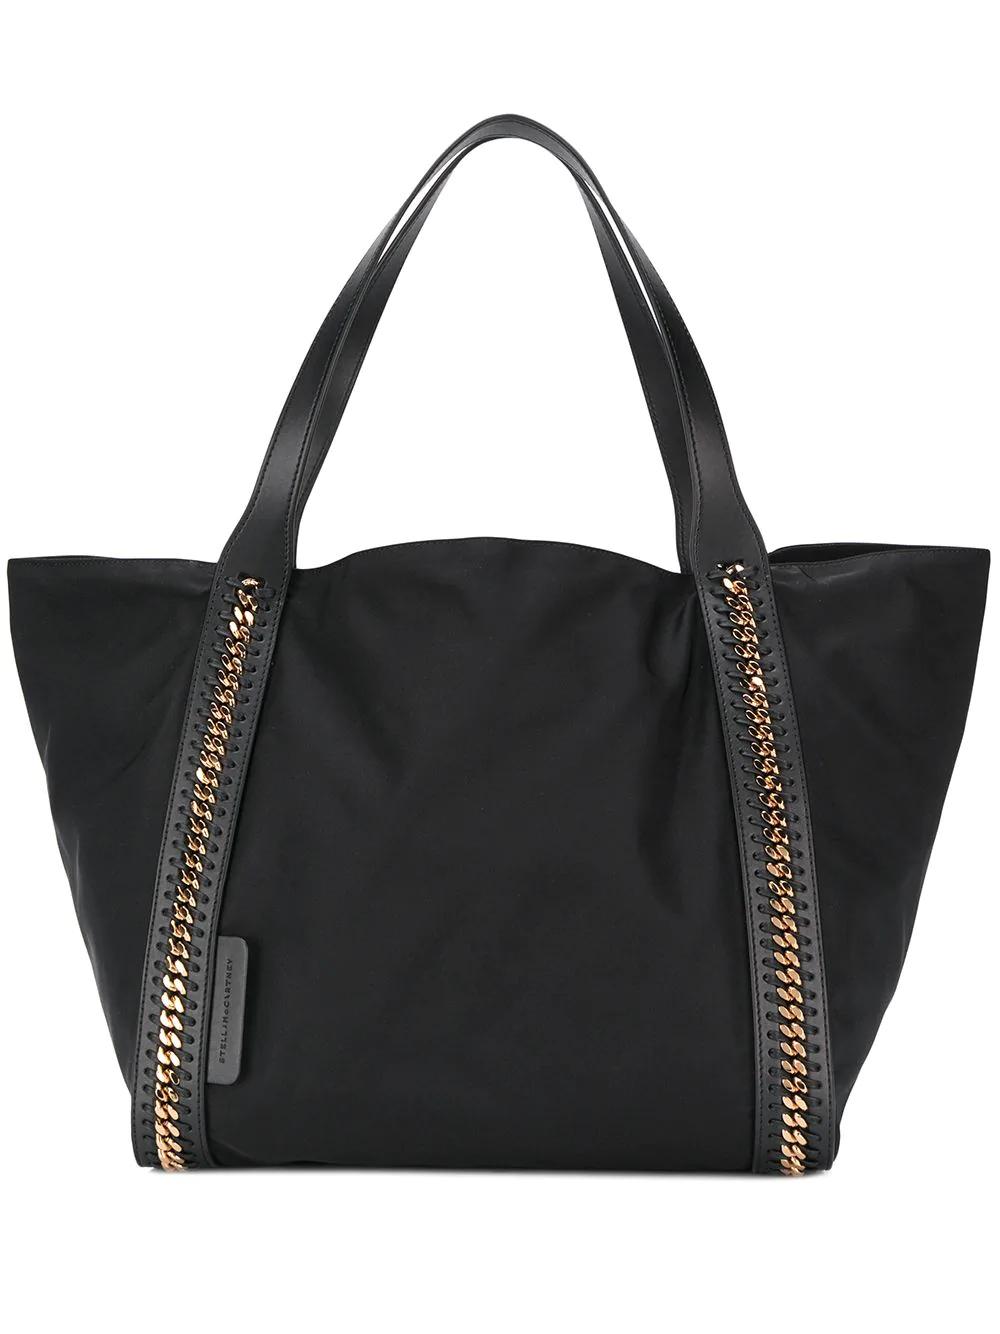 ff683fc8f1f1 Stella Mccartney Falabella Large Tote Bag - Black